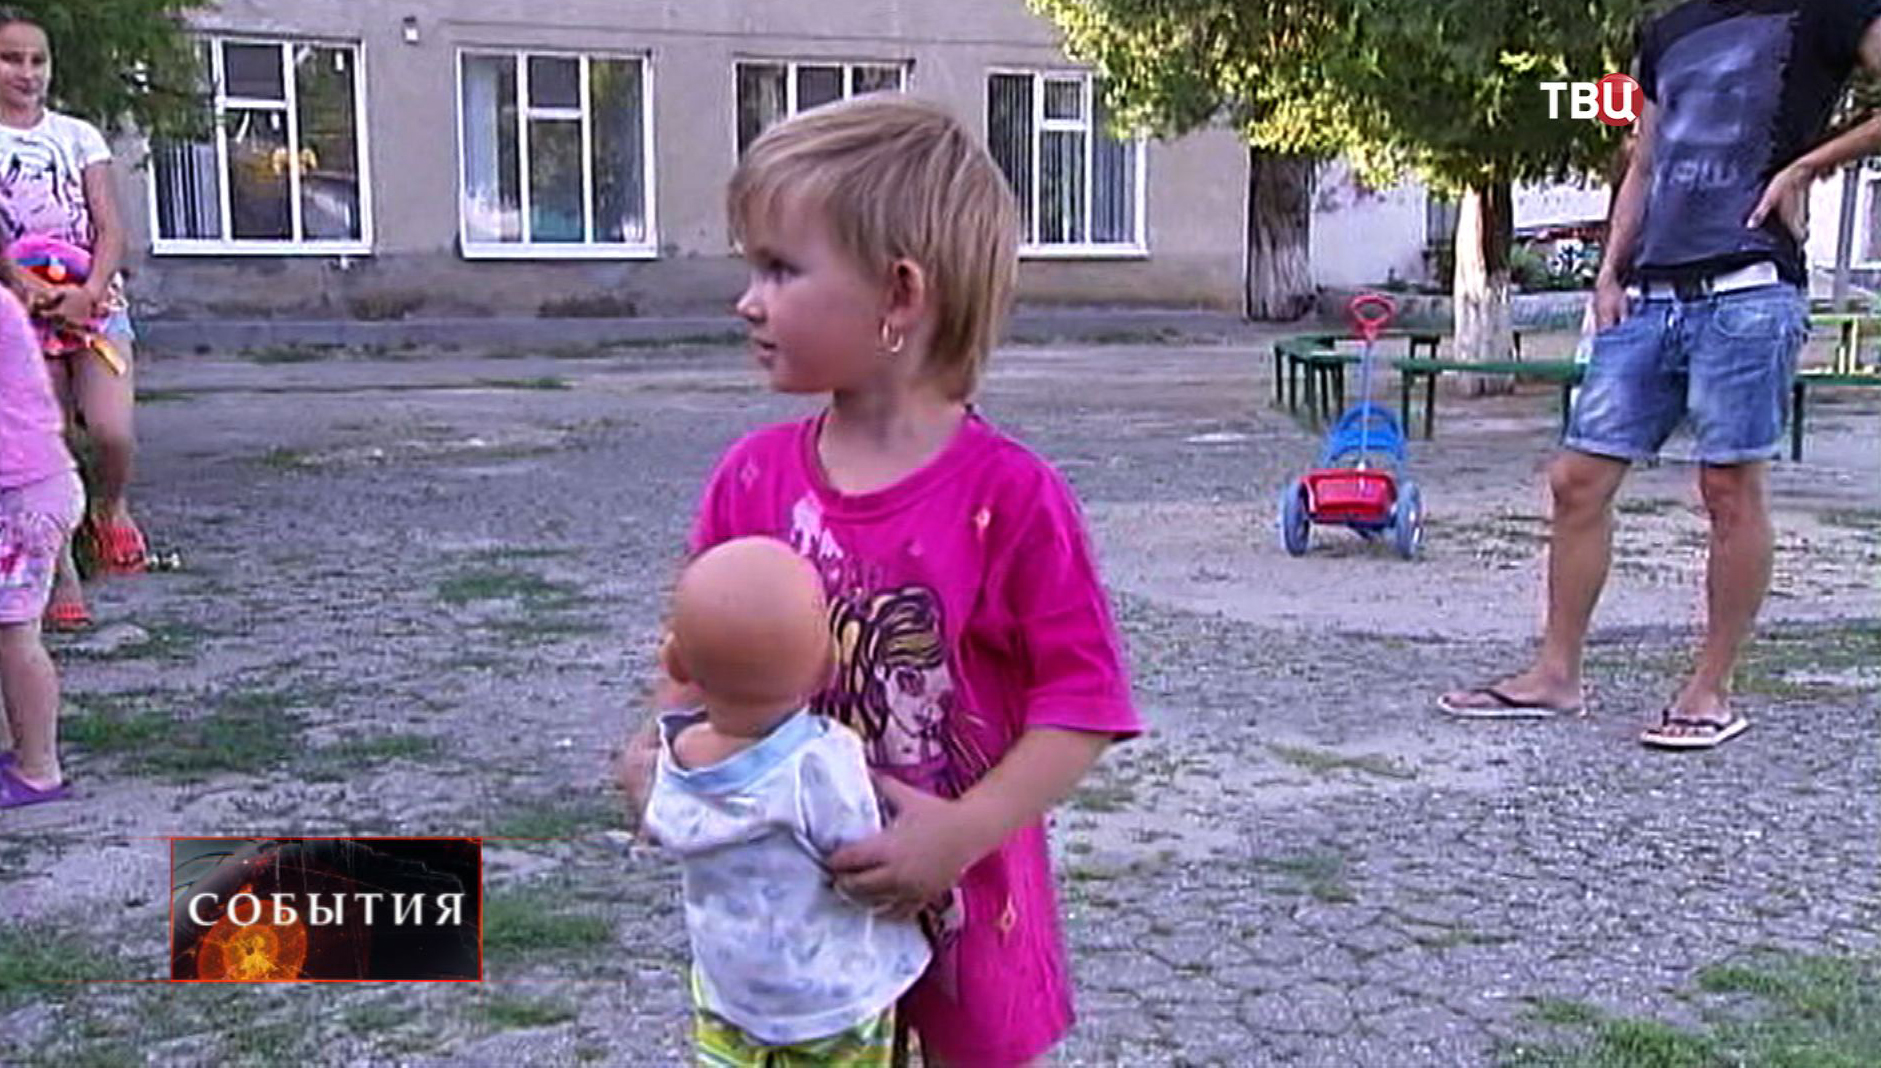 сайт знакомств беженцев из украины